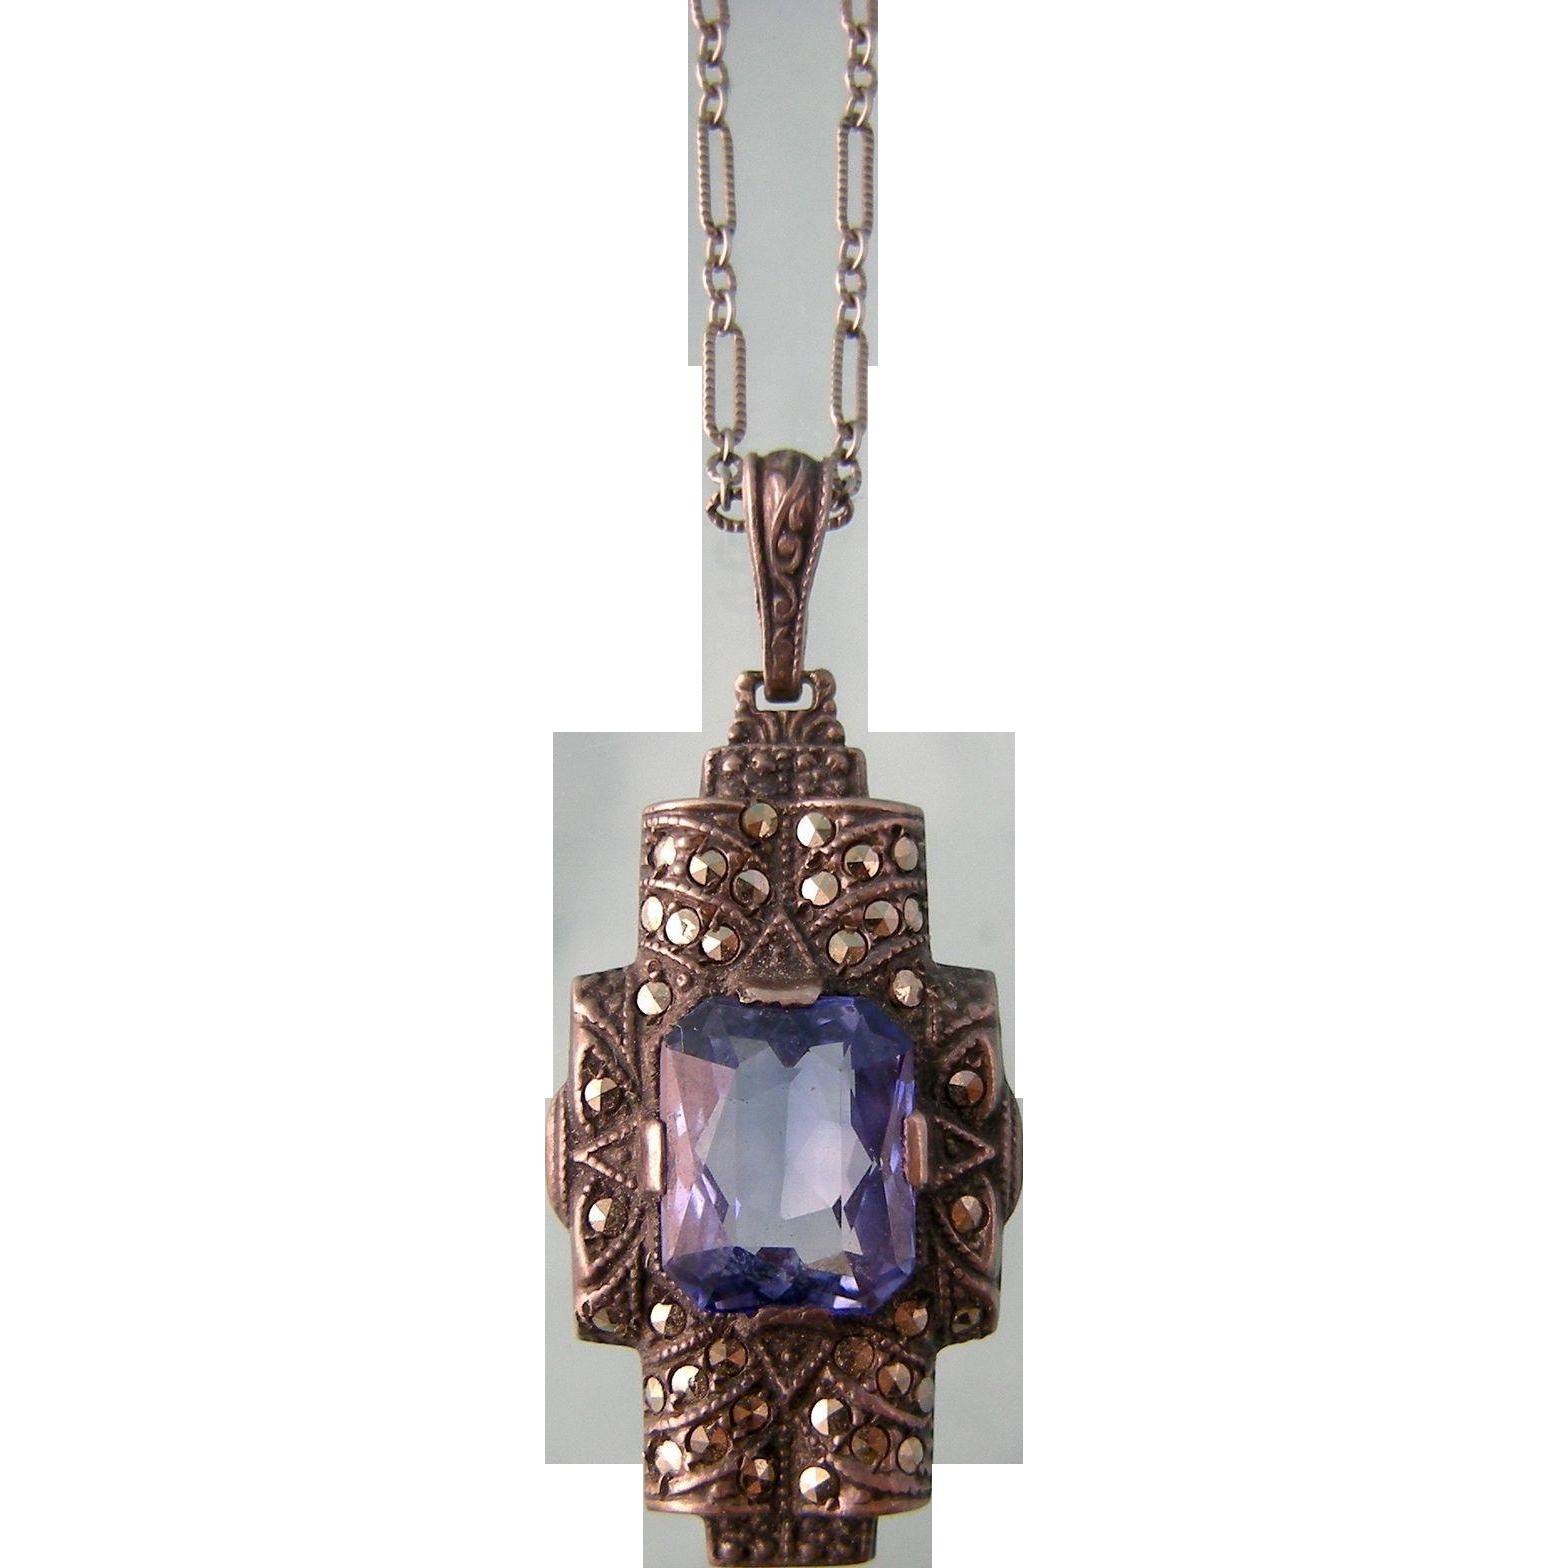 Art Deco Blue Spinel Pendant Necklace with Marcasites, Uncas, Sterling